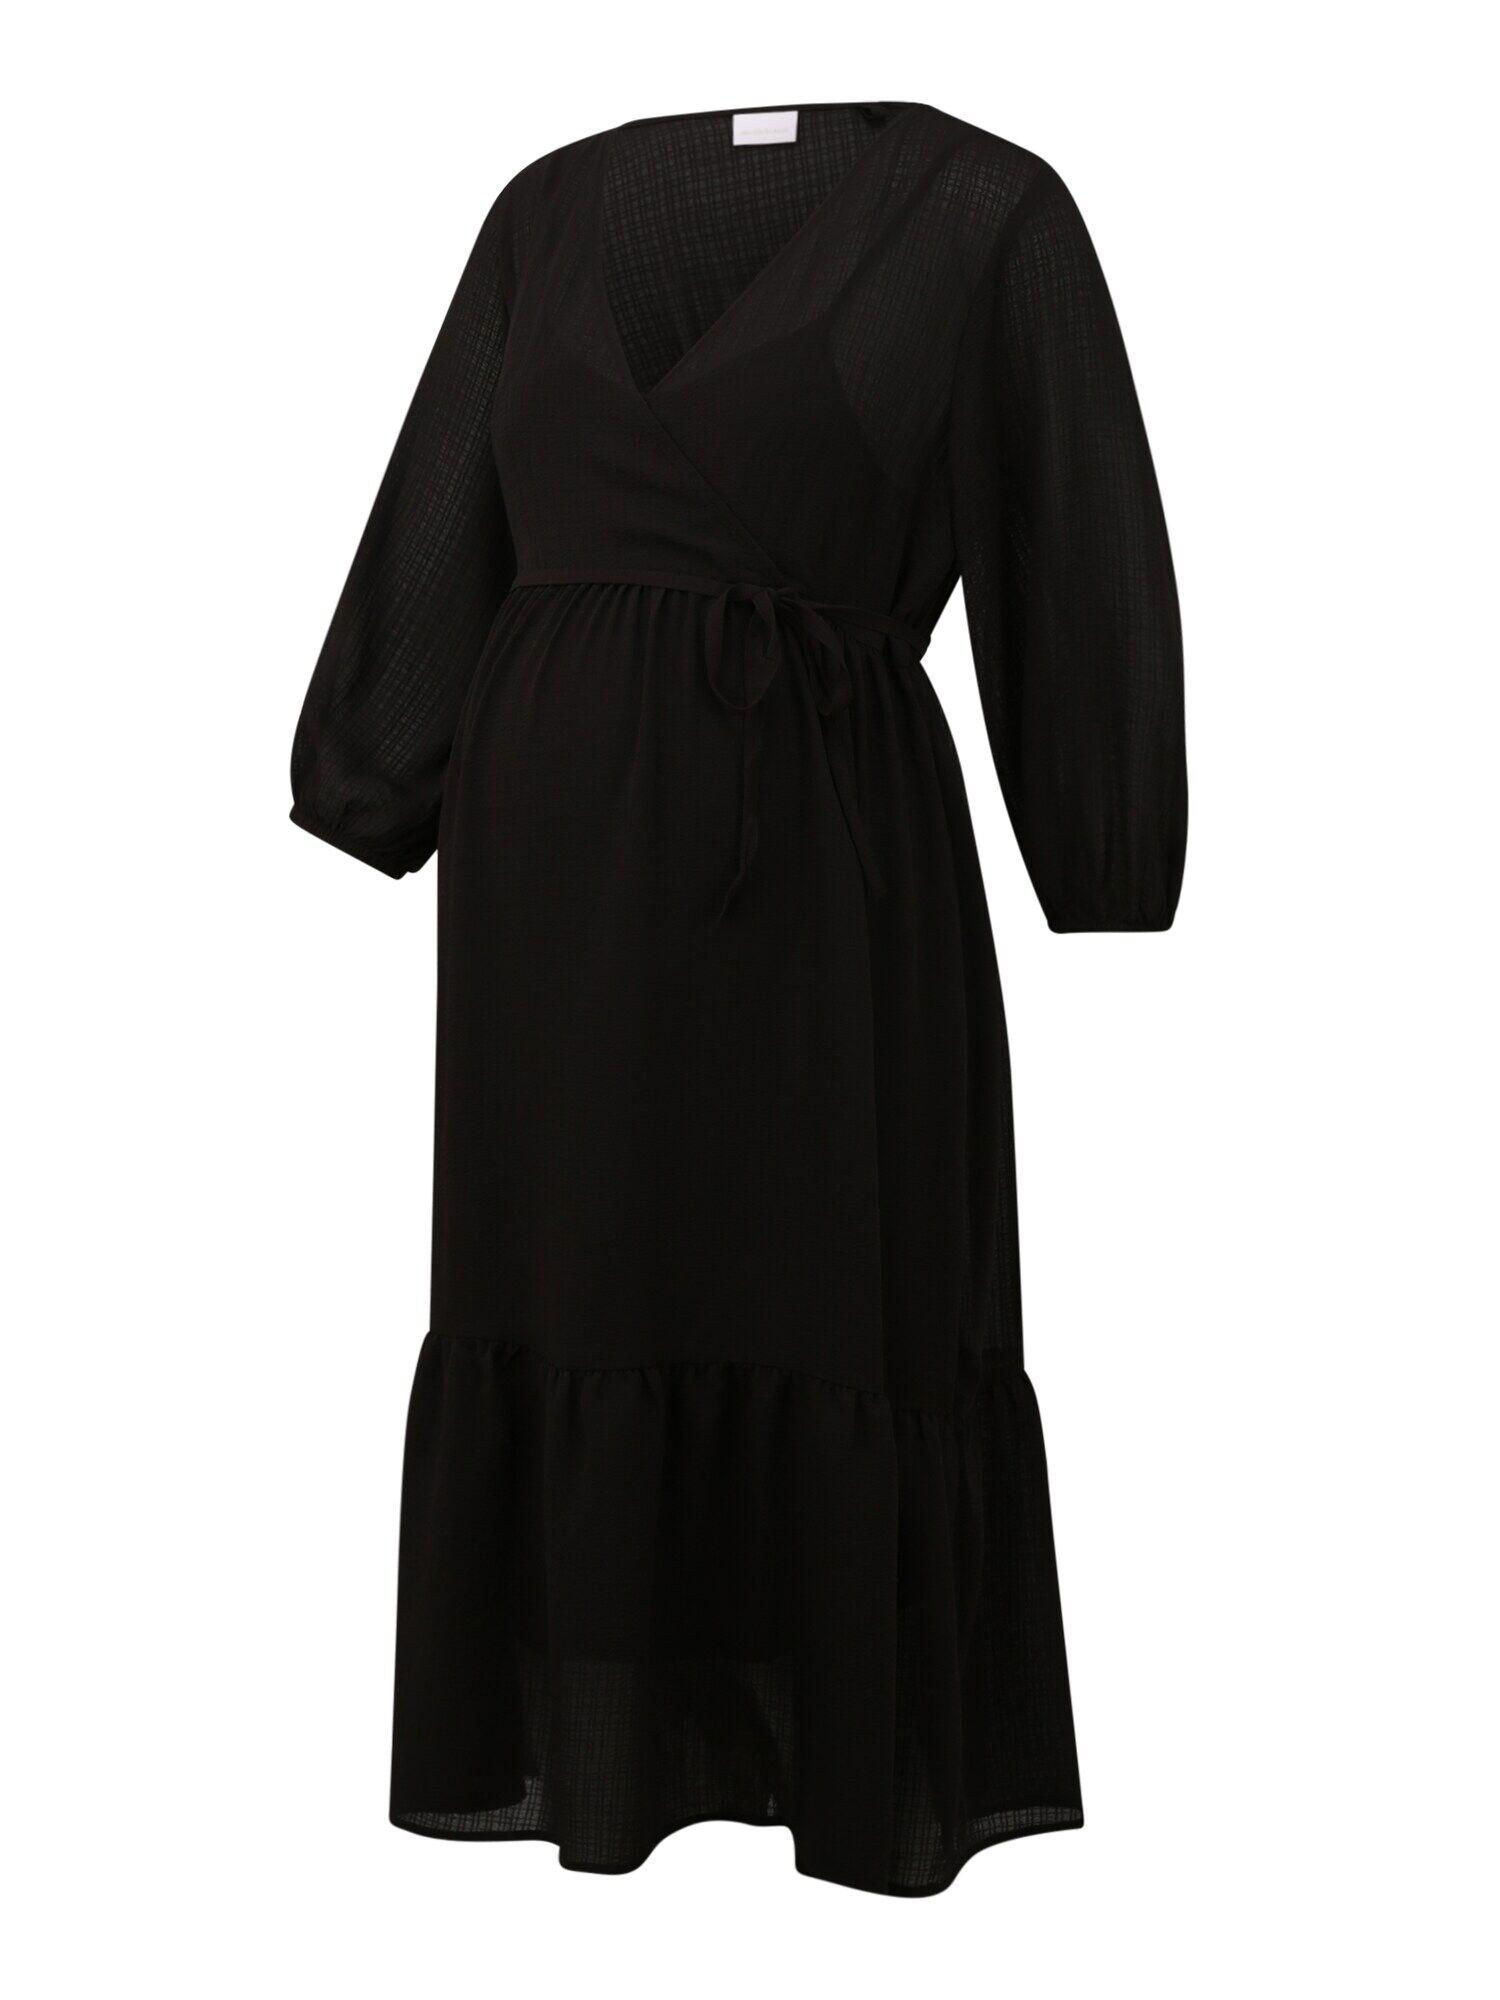 MAMALICIOUS Robe  - Noir - Taille: 36 - female